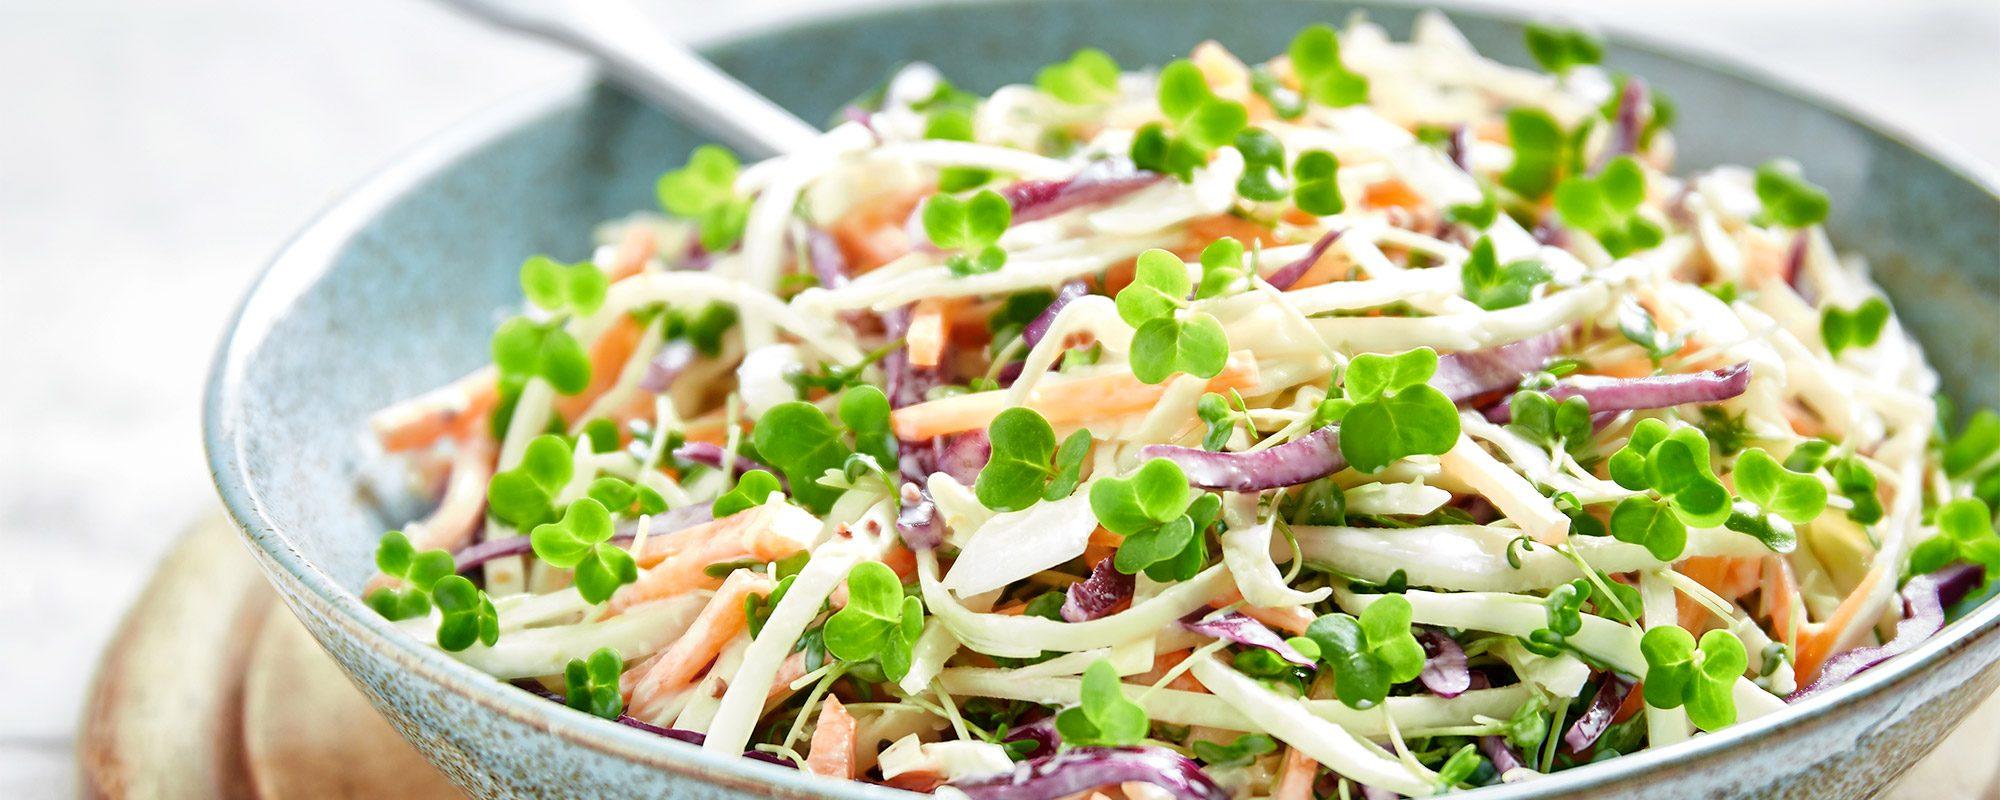 Coleslaw with Salad Cress